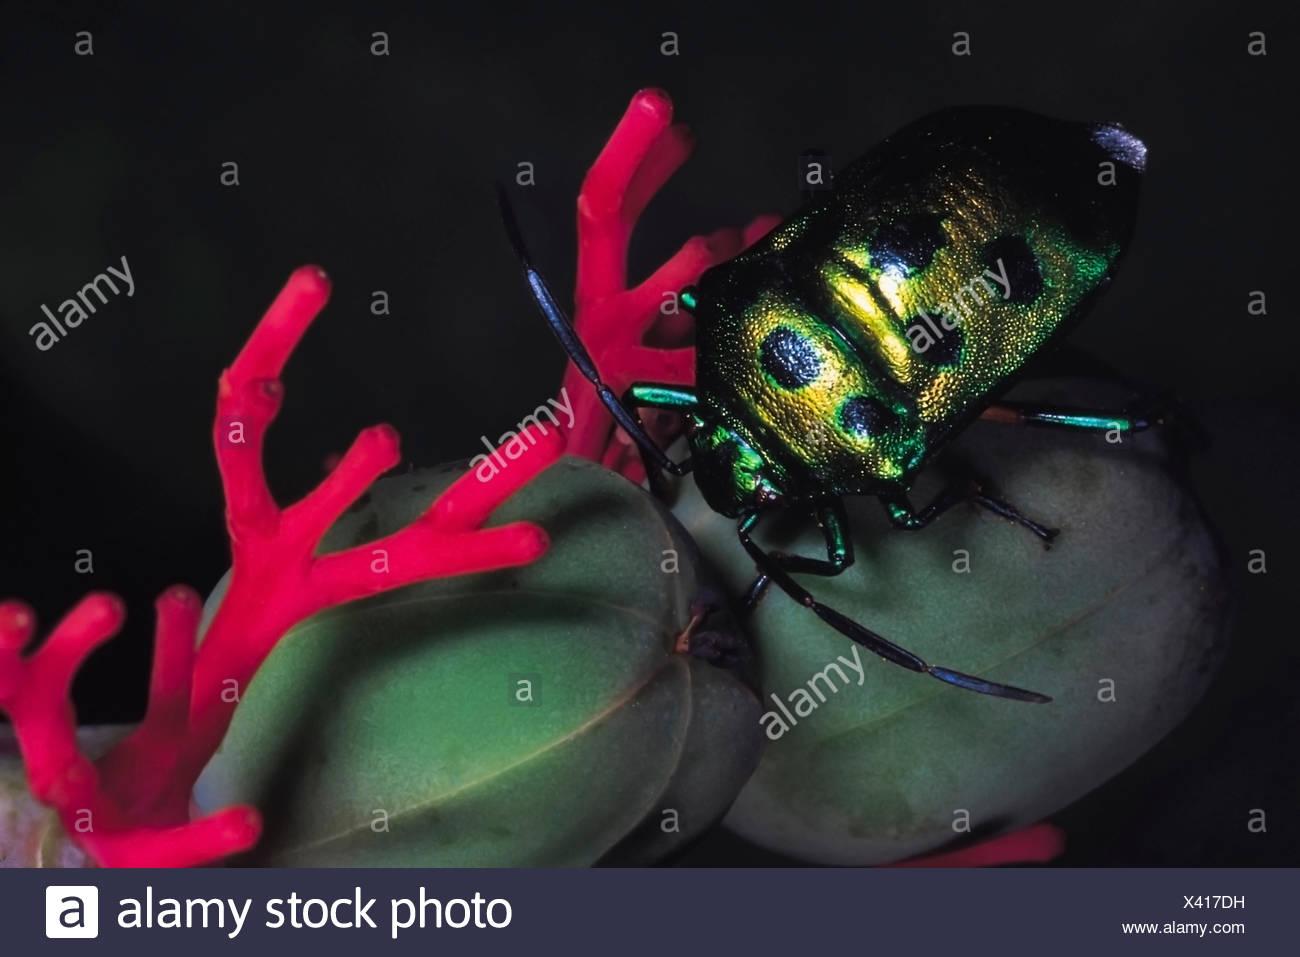 Jewel bug on Jatropa. Order: Hemiptera. Maharashtra, India. Stock Photo